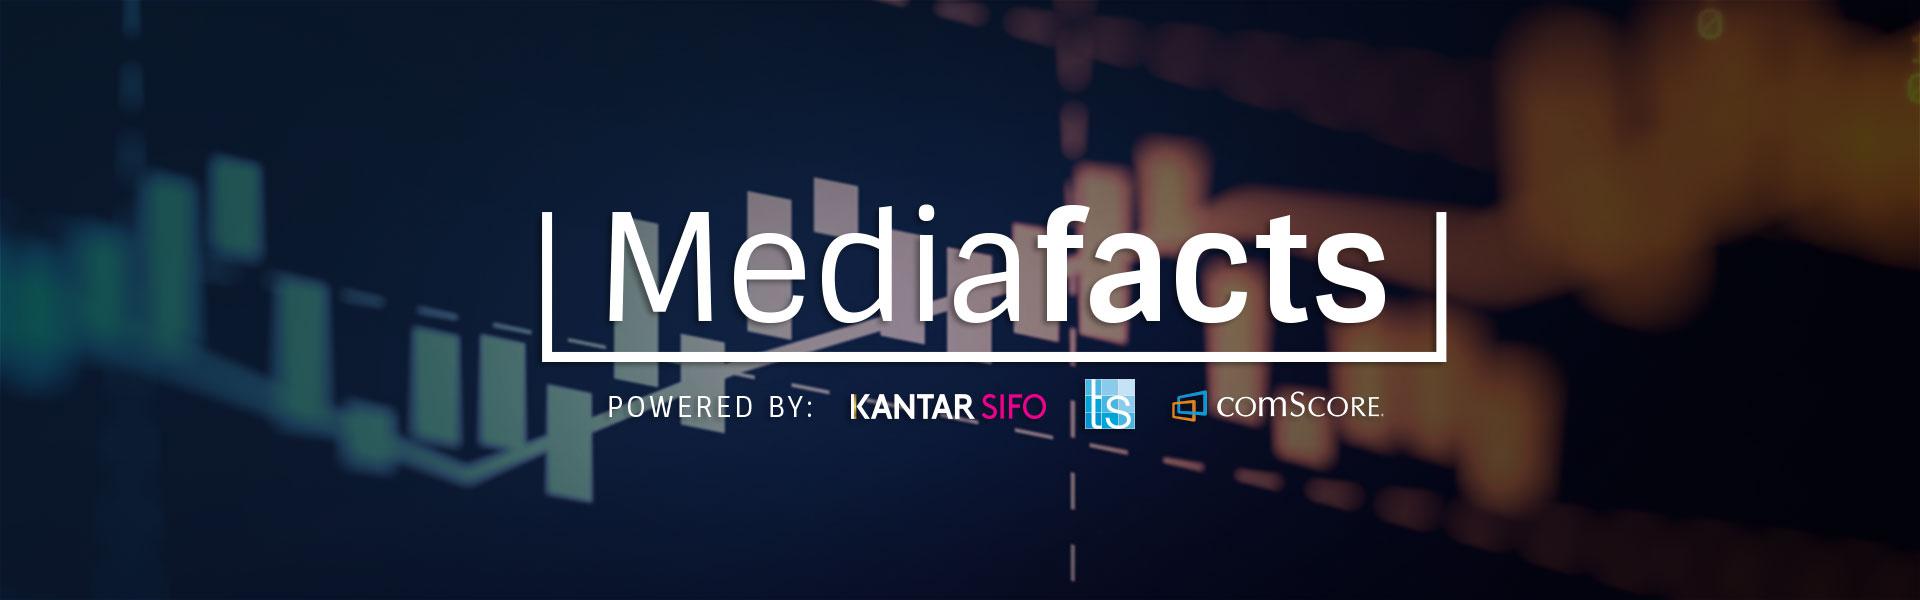 Kantar Sifo mediafacts_top.jpg